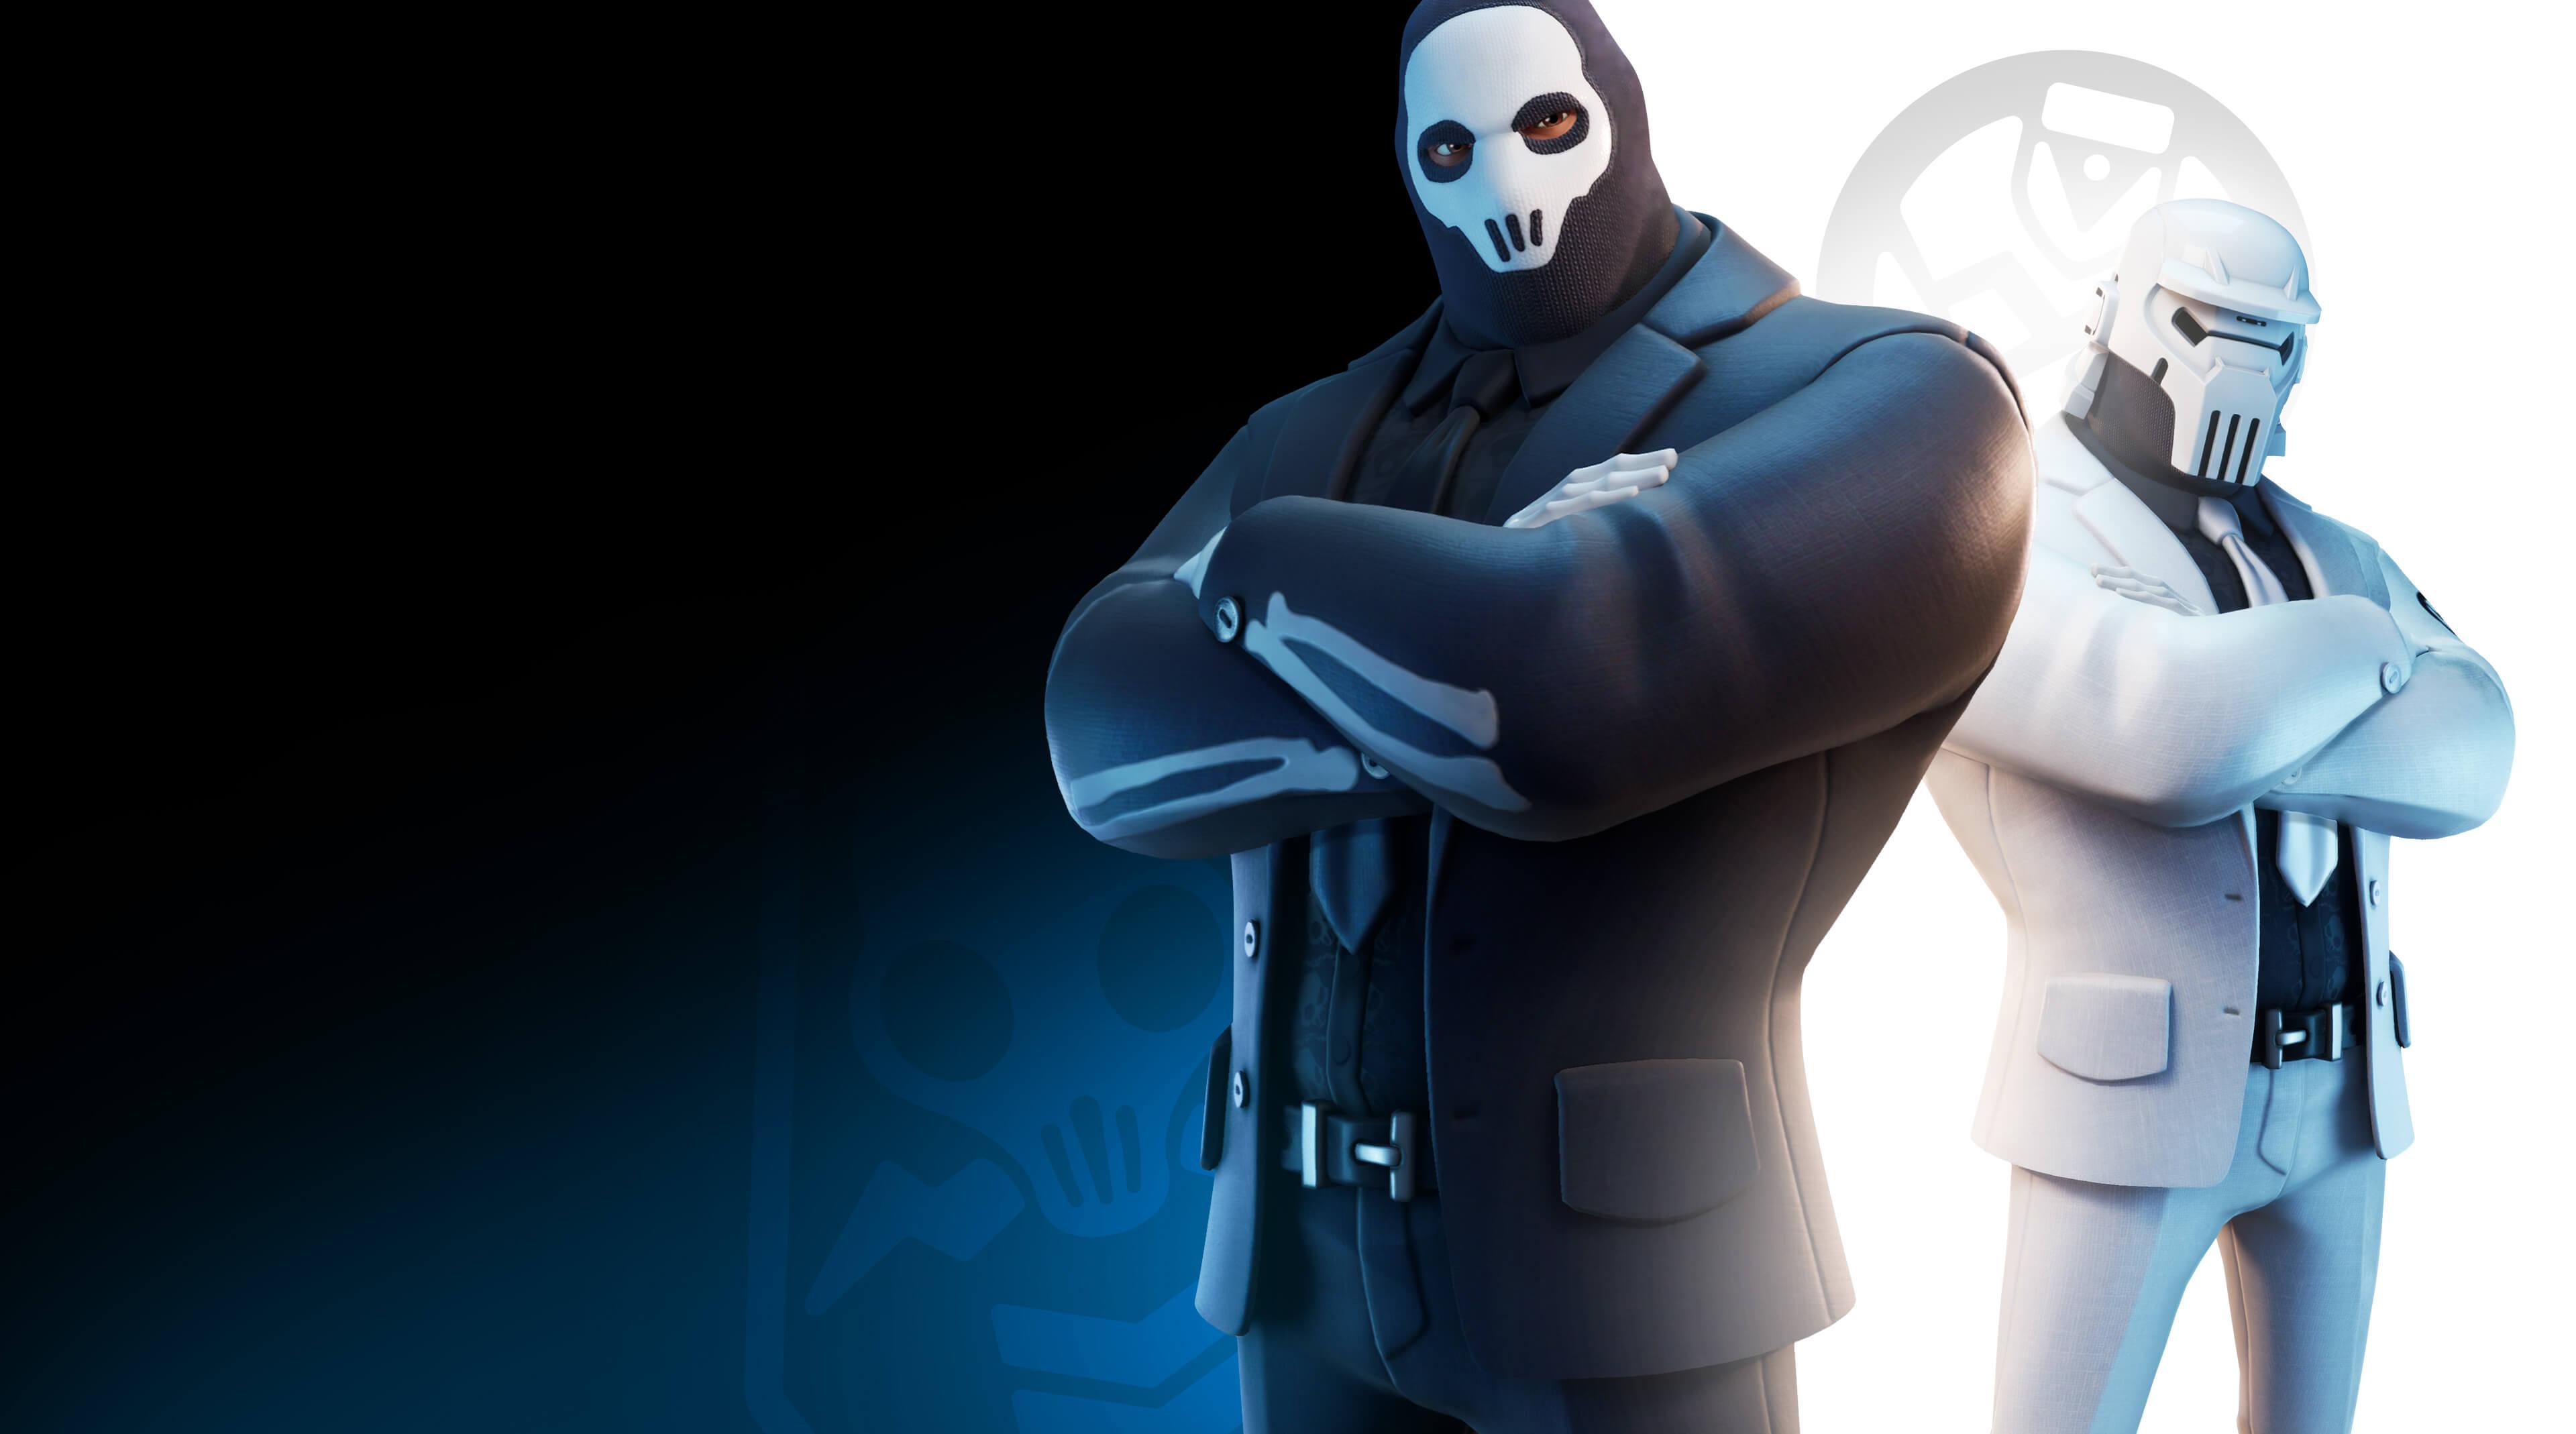 Fortnite Für Windows 10 epic games' fortnite